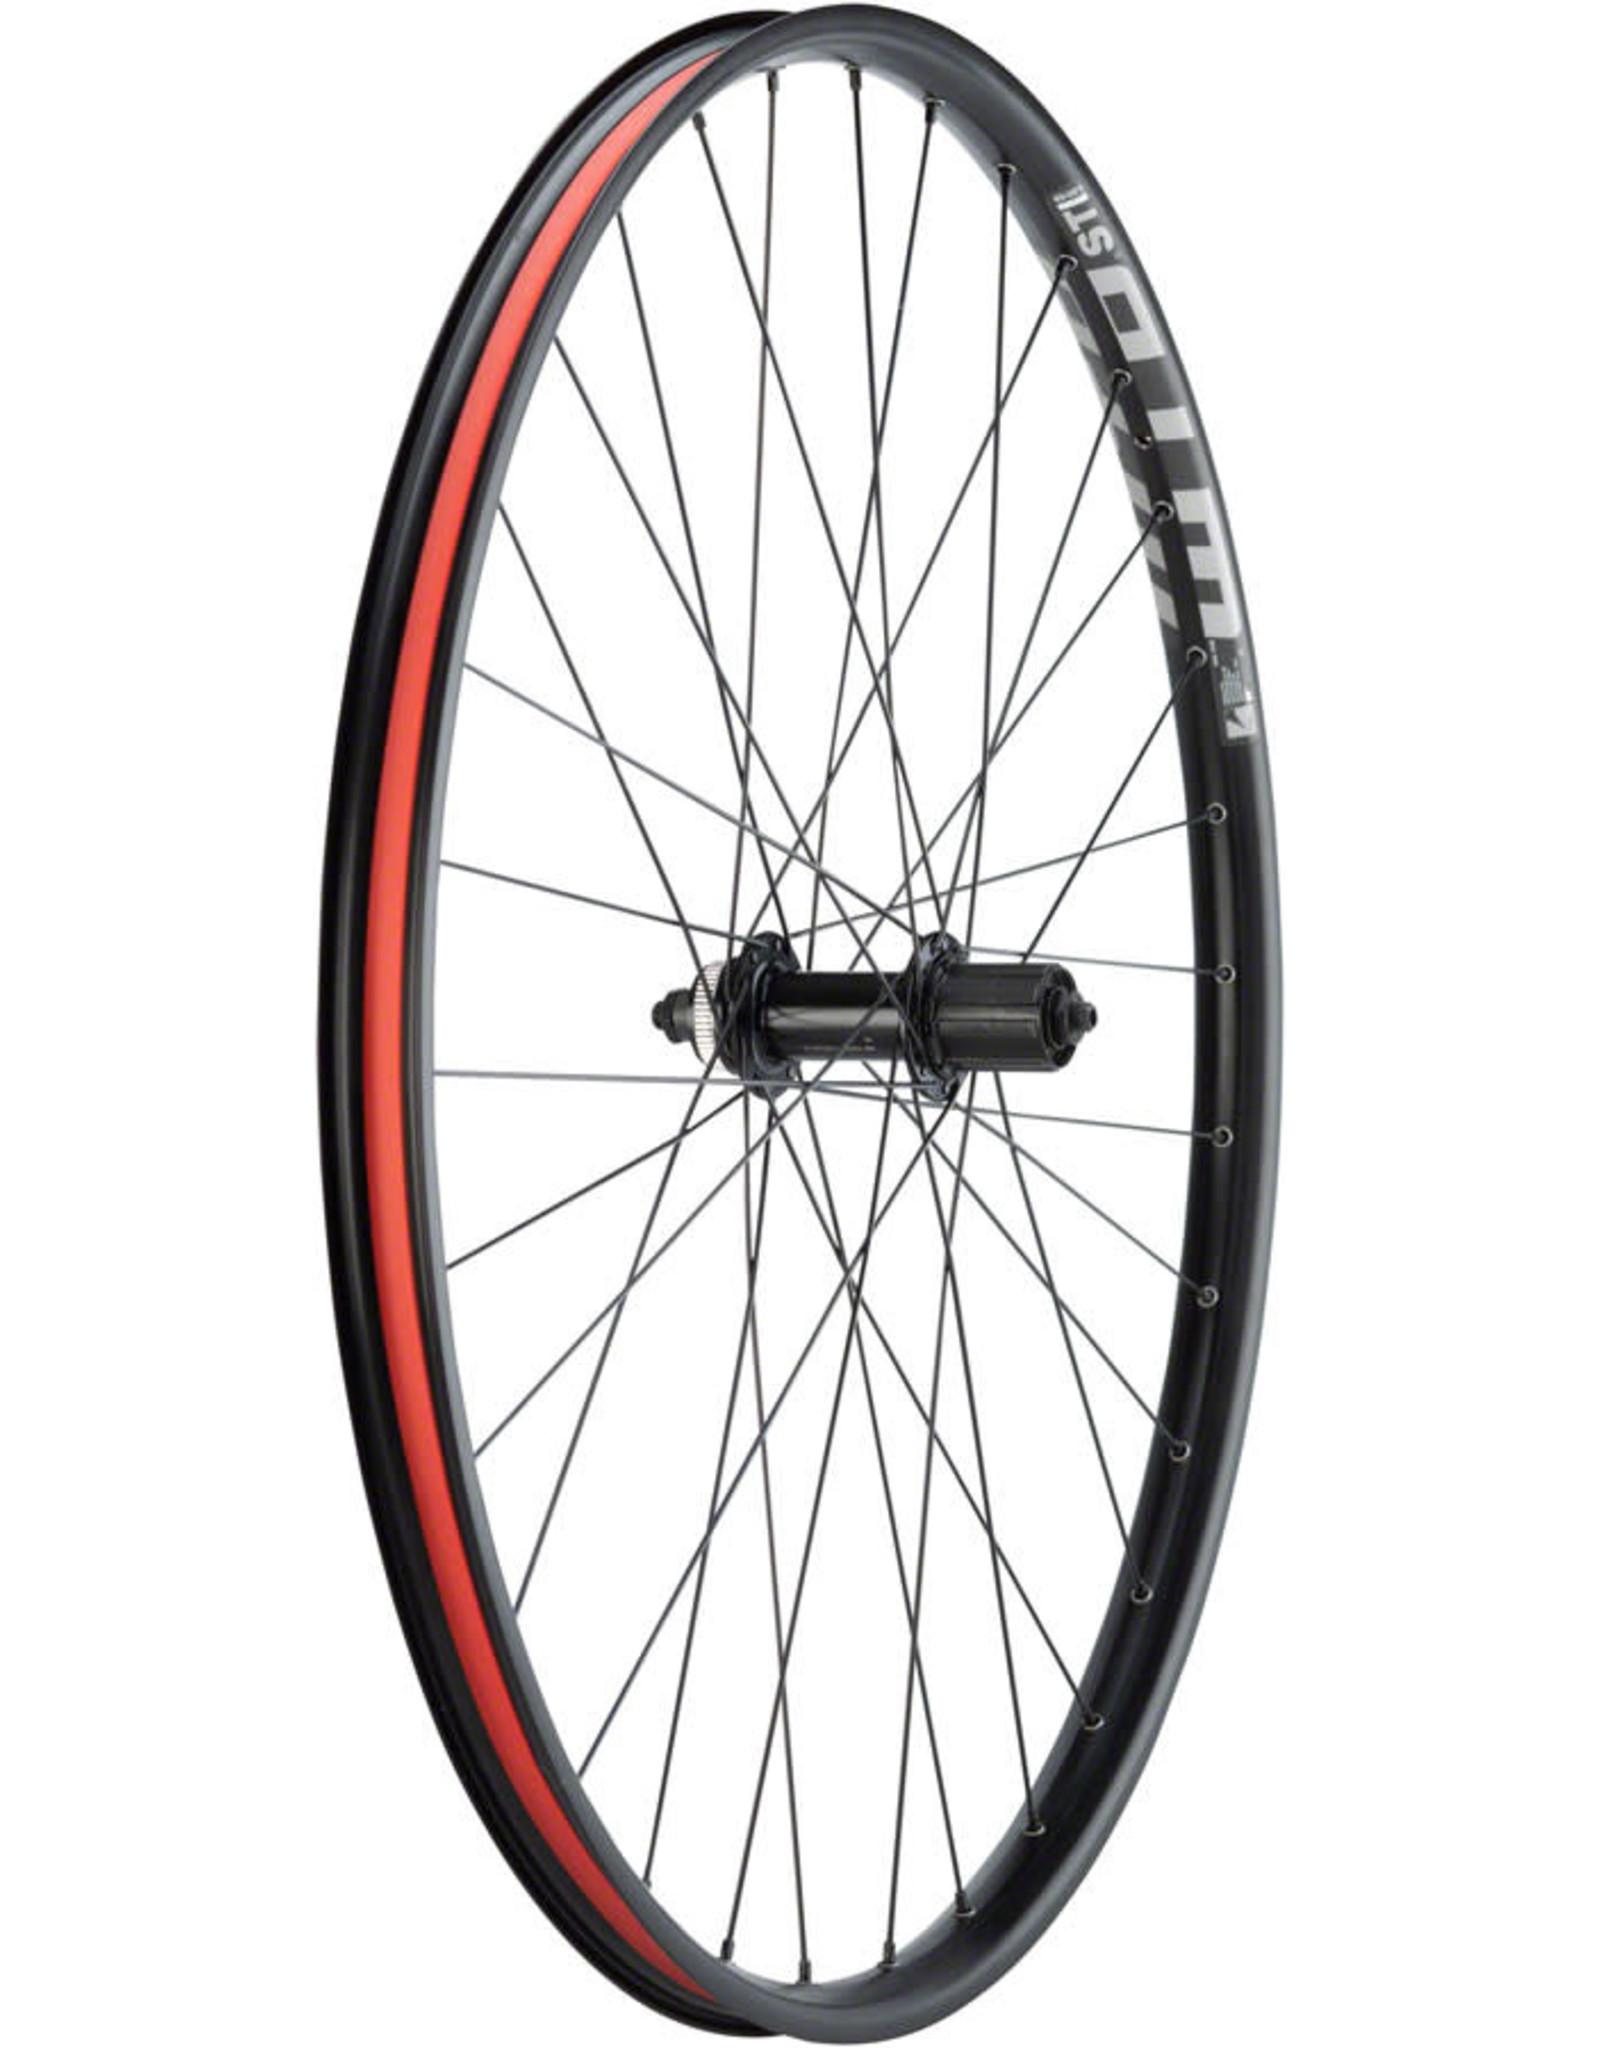 "Quality Wheels WTB ST Light i29 - 29"", QR x 141mm, Center-Lock, HG 10, Black, Rear Wheel"